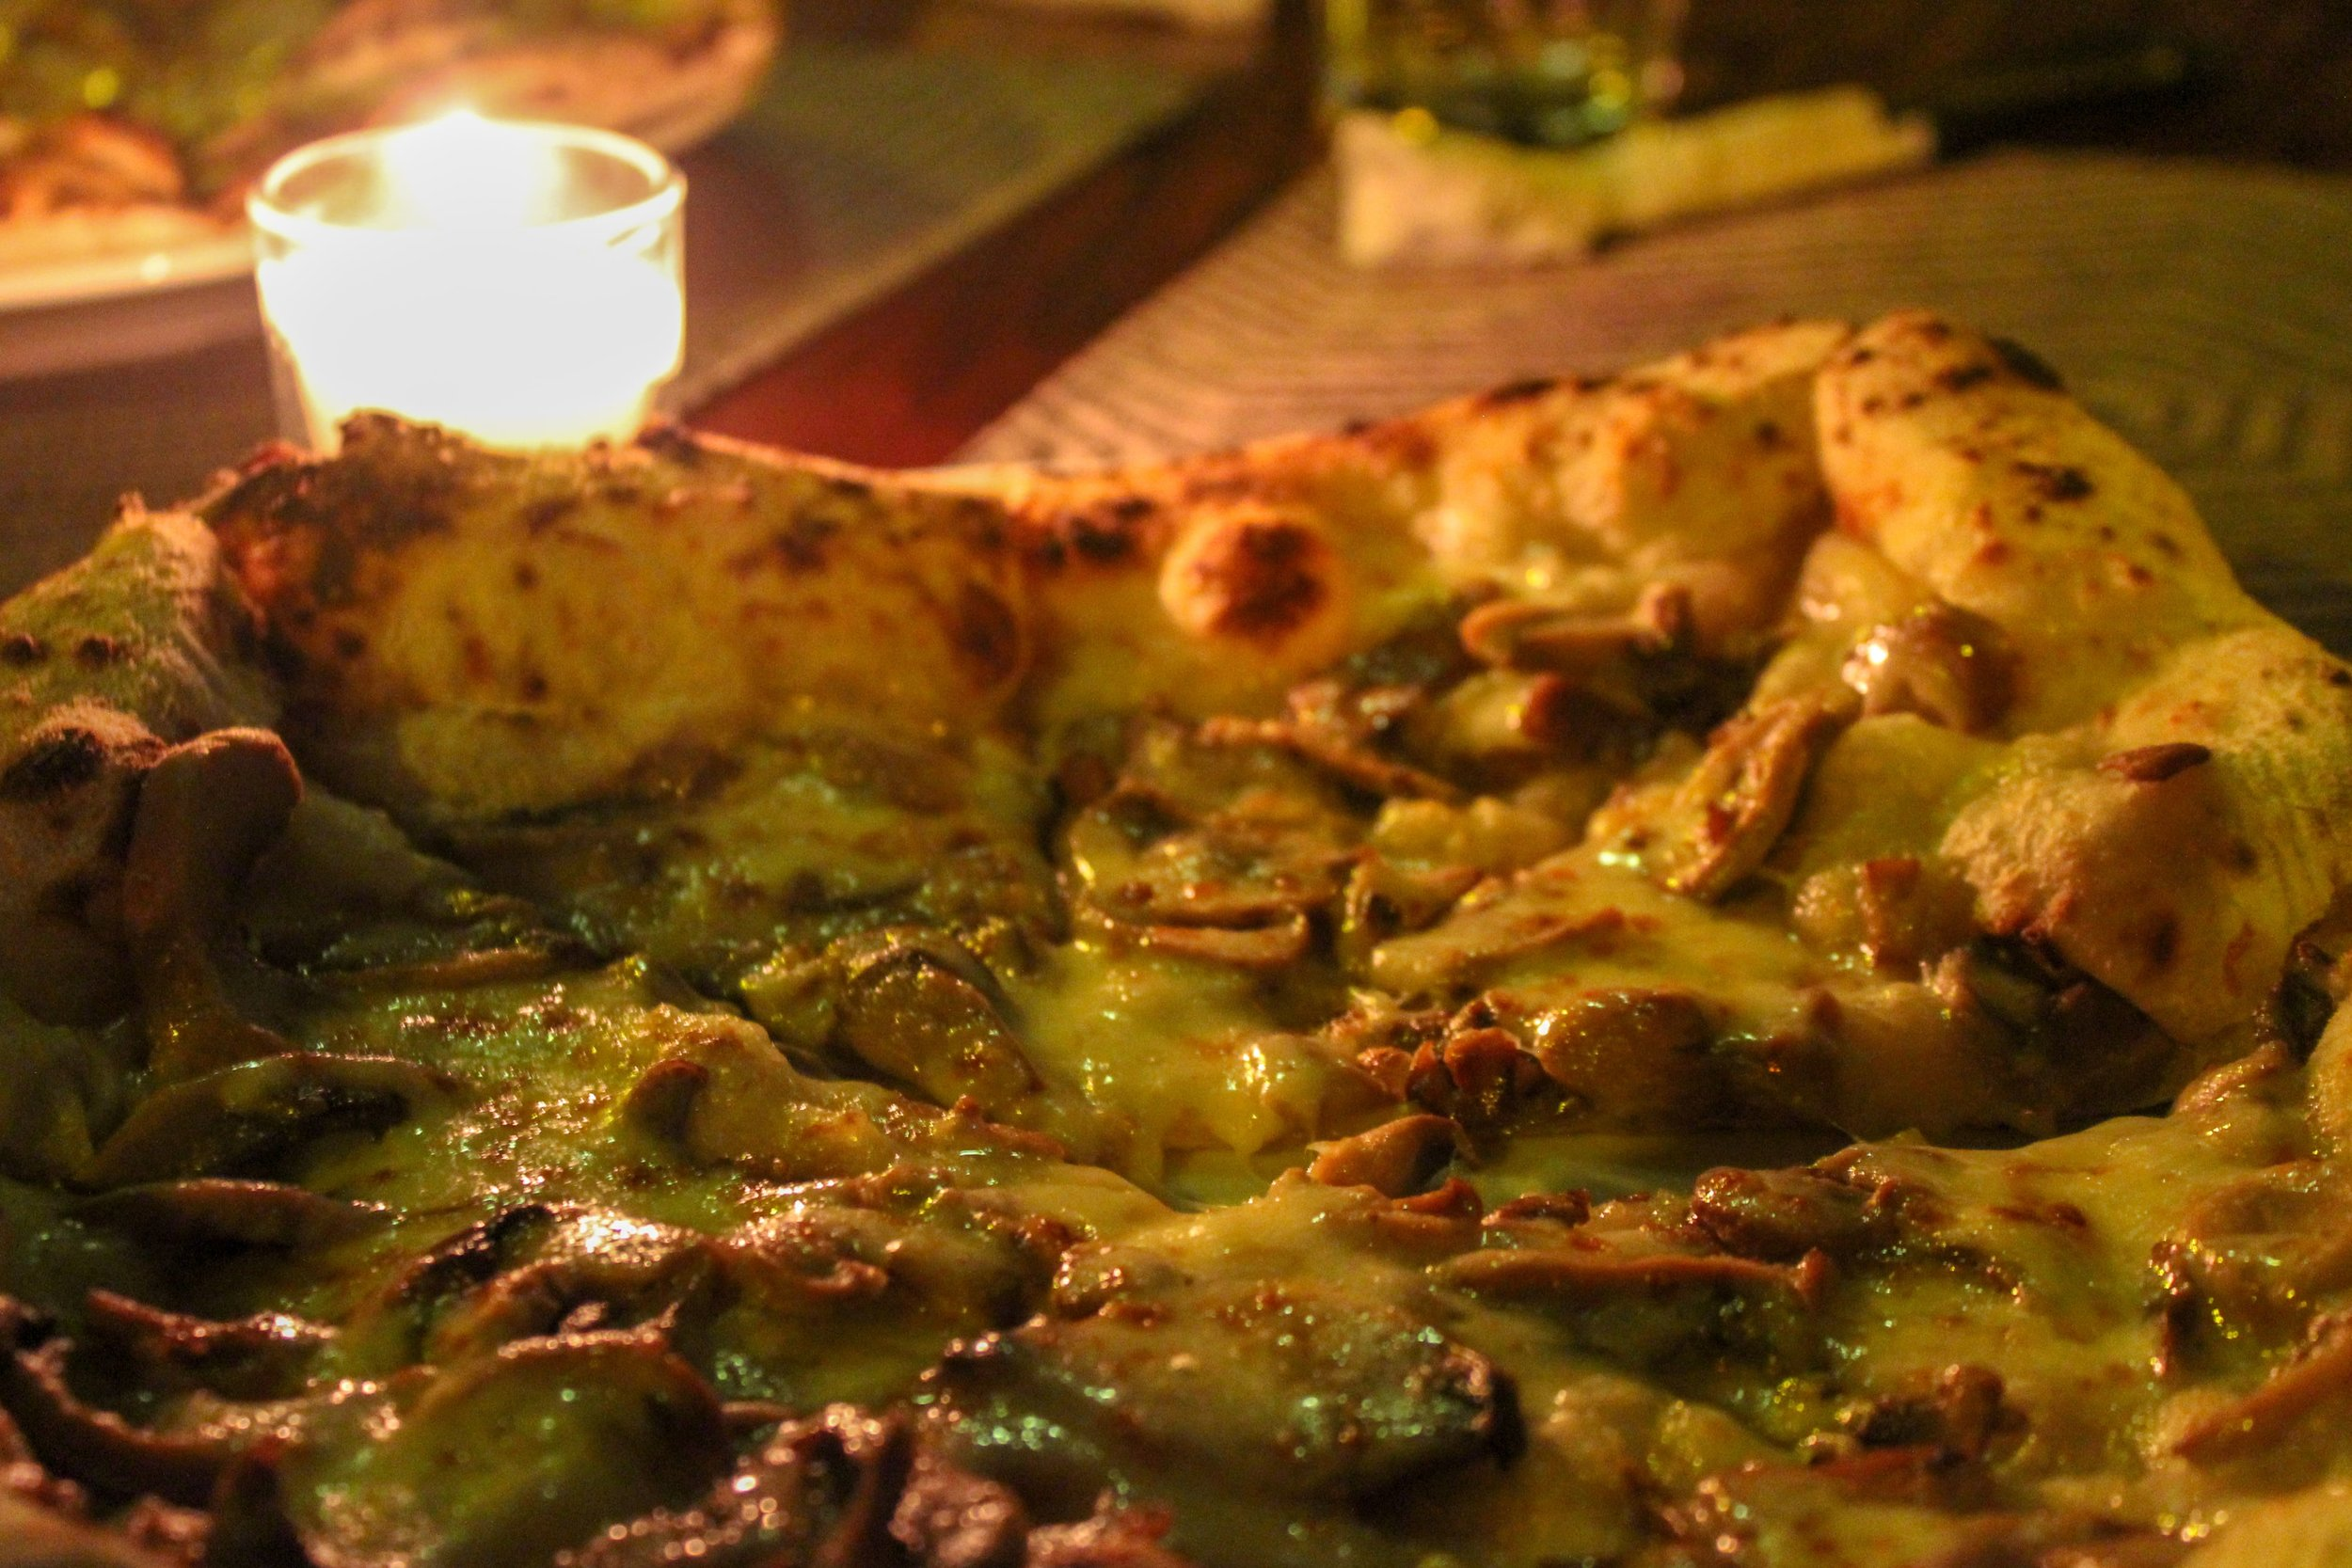 freshly baked pizza on a thin, chewy crust, Mediterranea, Isla Ometepe, Selvista